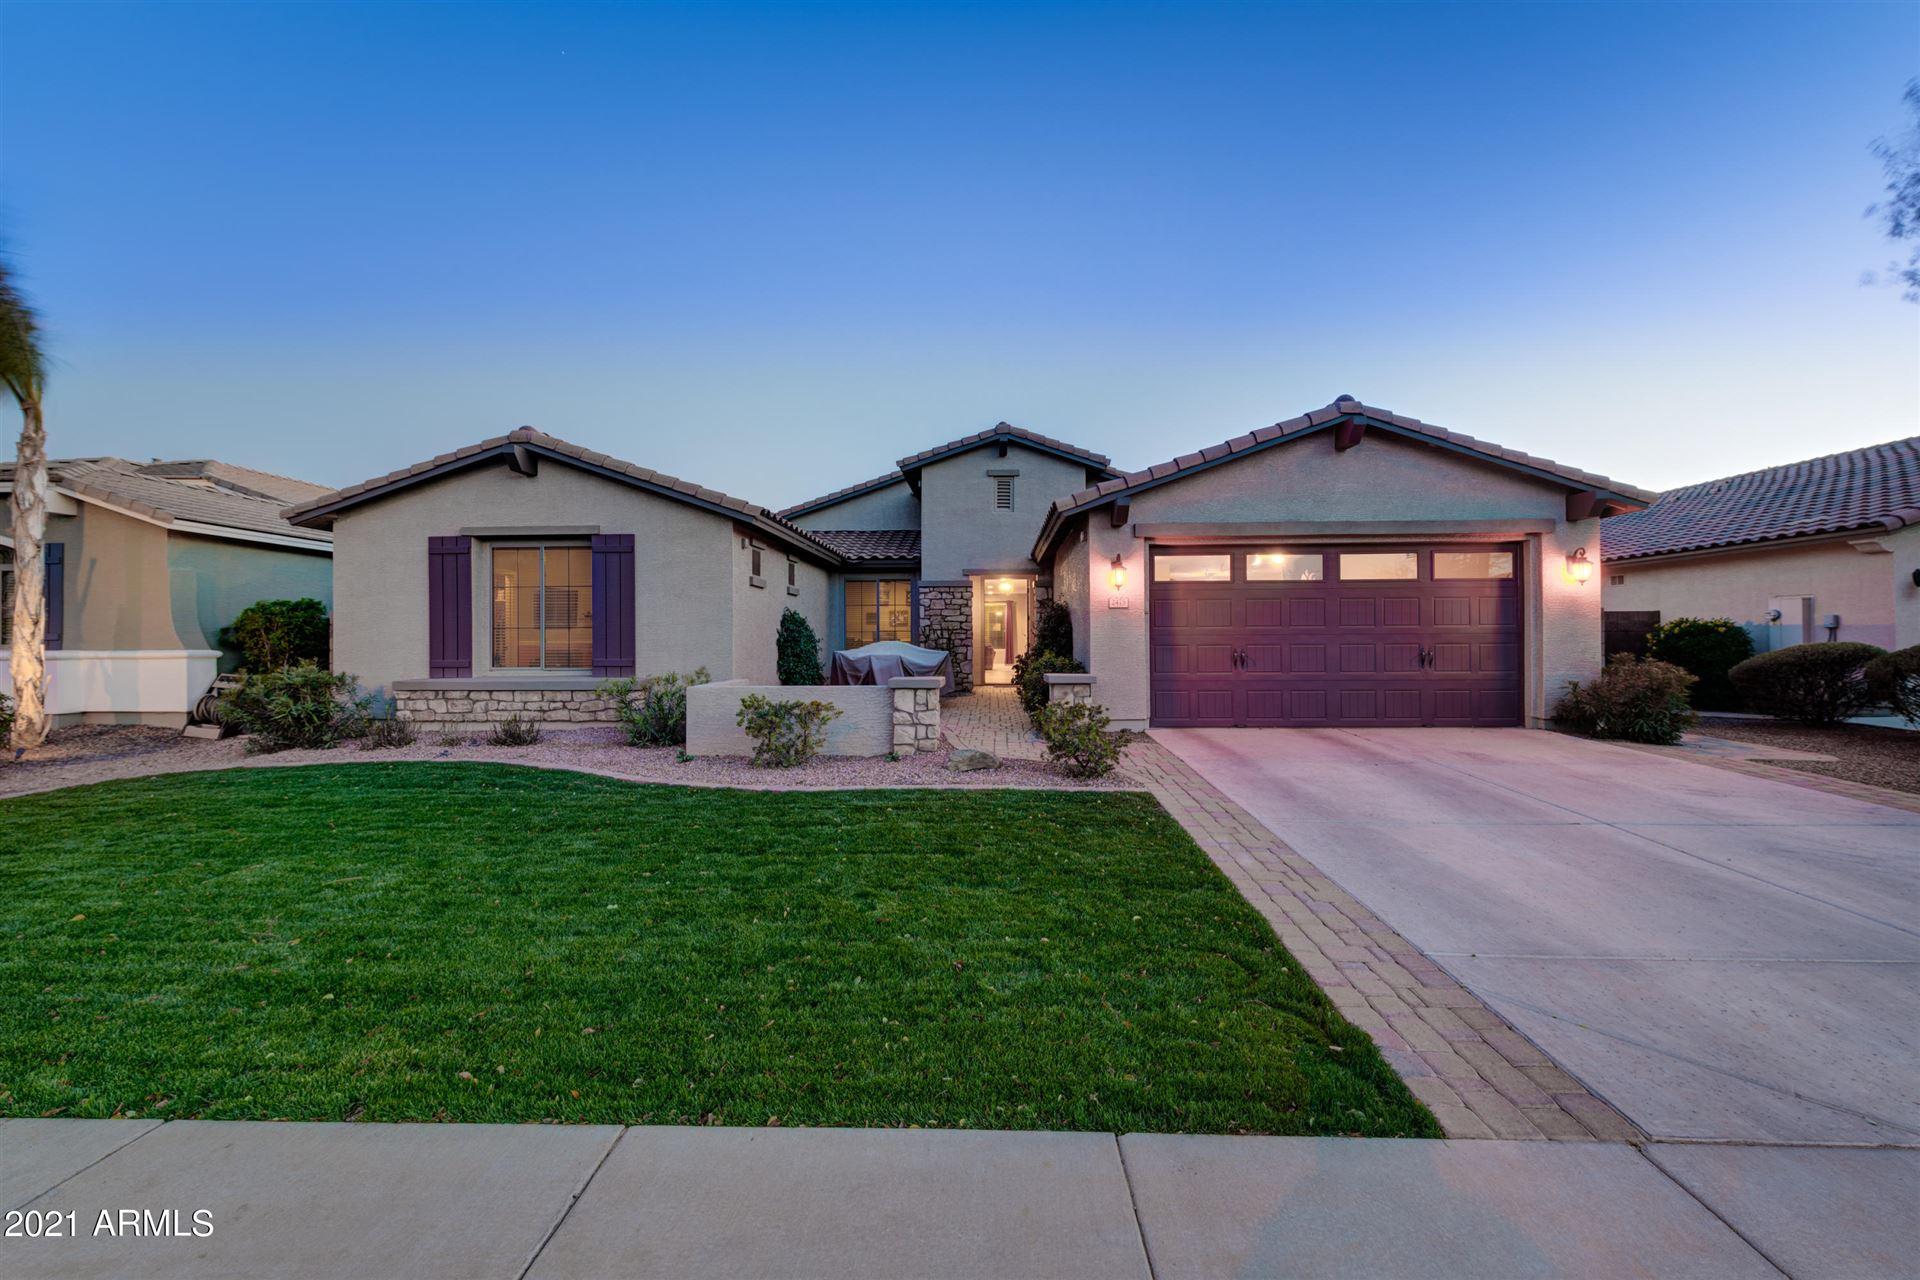 Photo of 2475 E NARROWLEAF Drive, Gilbert, AZ 85298 (MLS # 6202602)